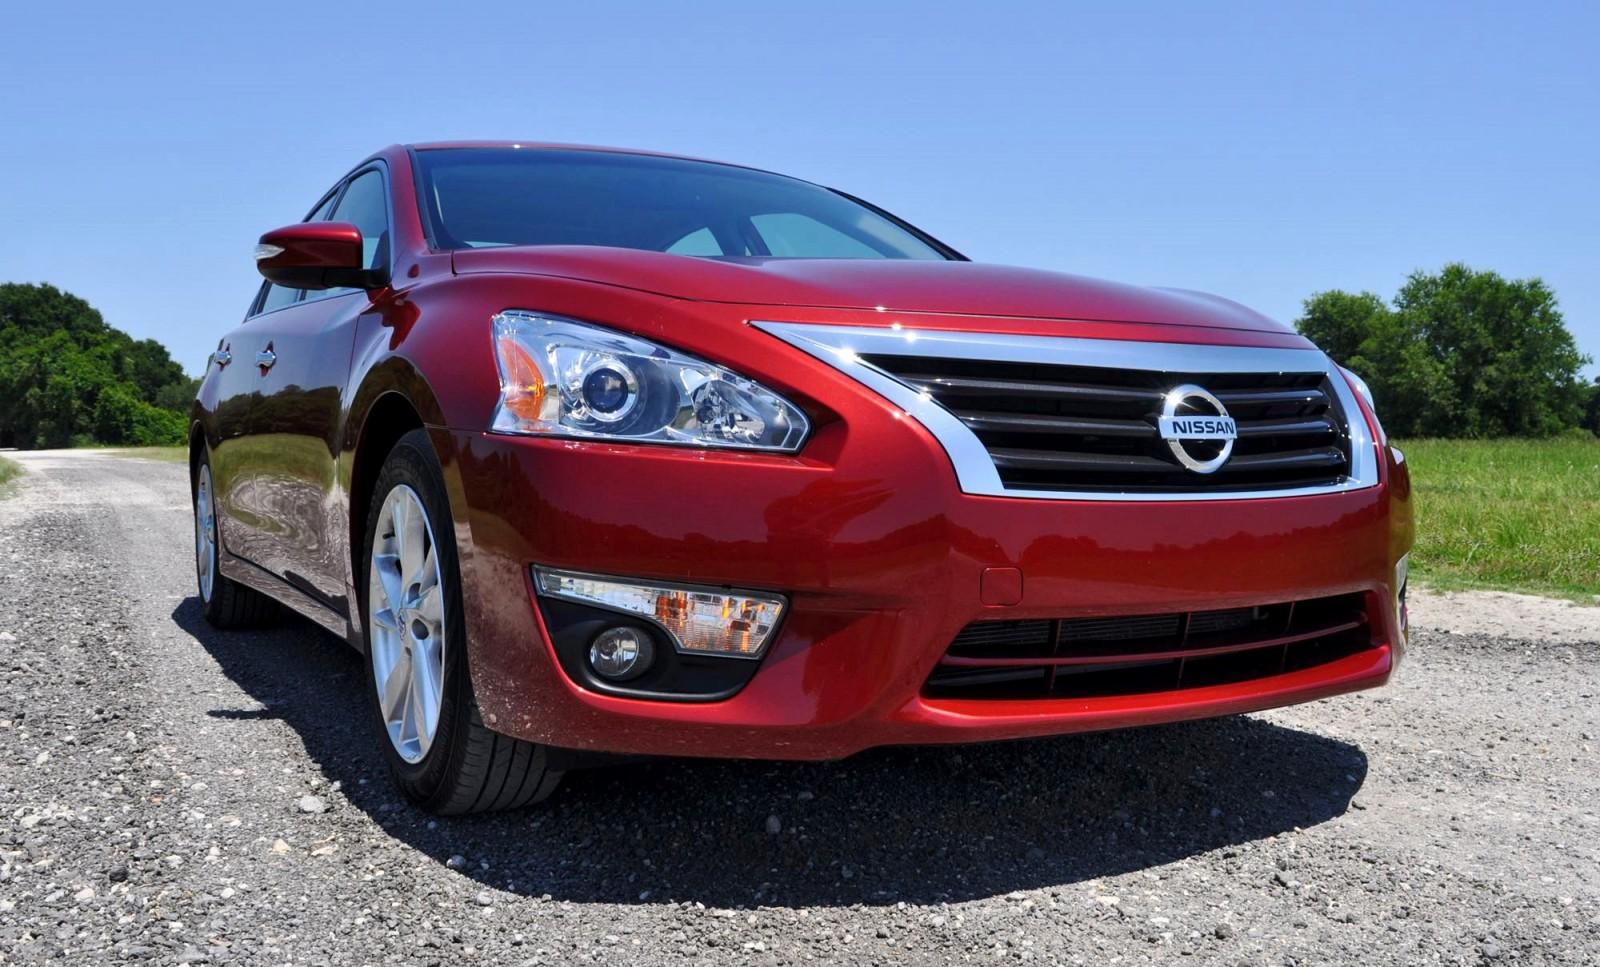 2015 Nissan Altima 2.5 Sv >> 2015 Nissan Altima 2.5SL Review